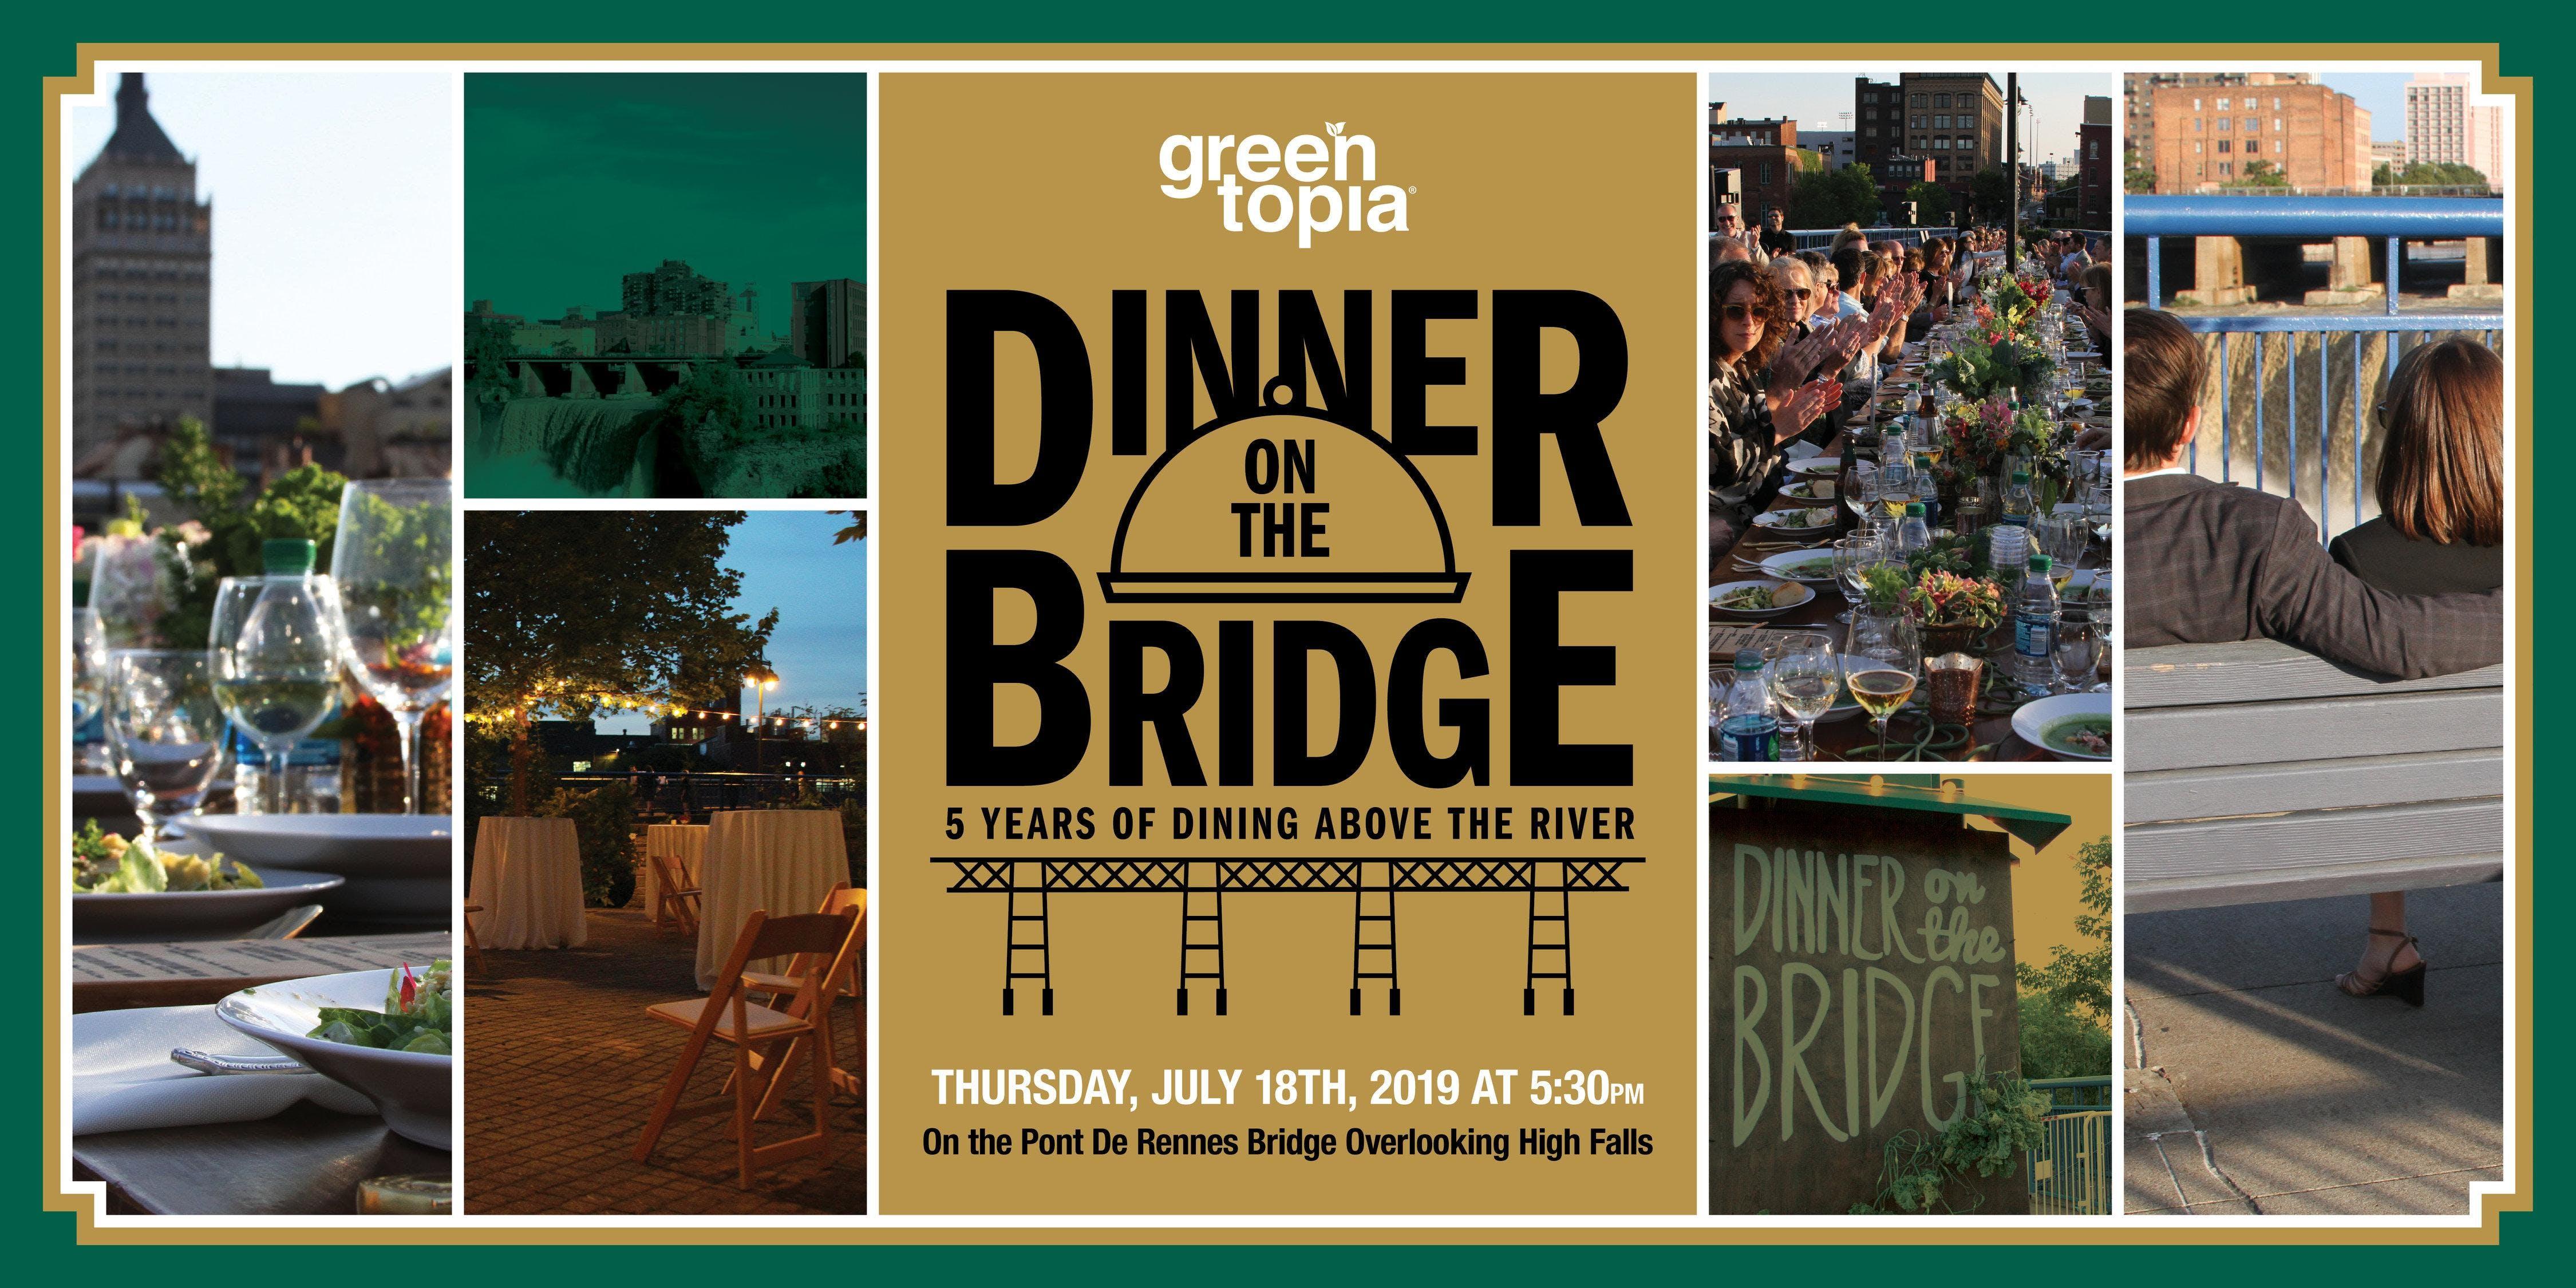 Dinner on the Bridge